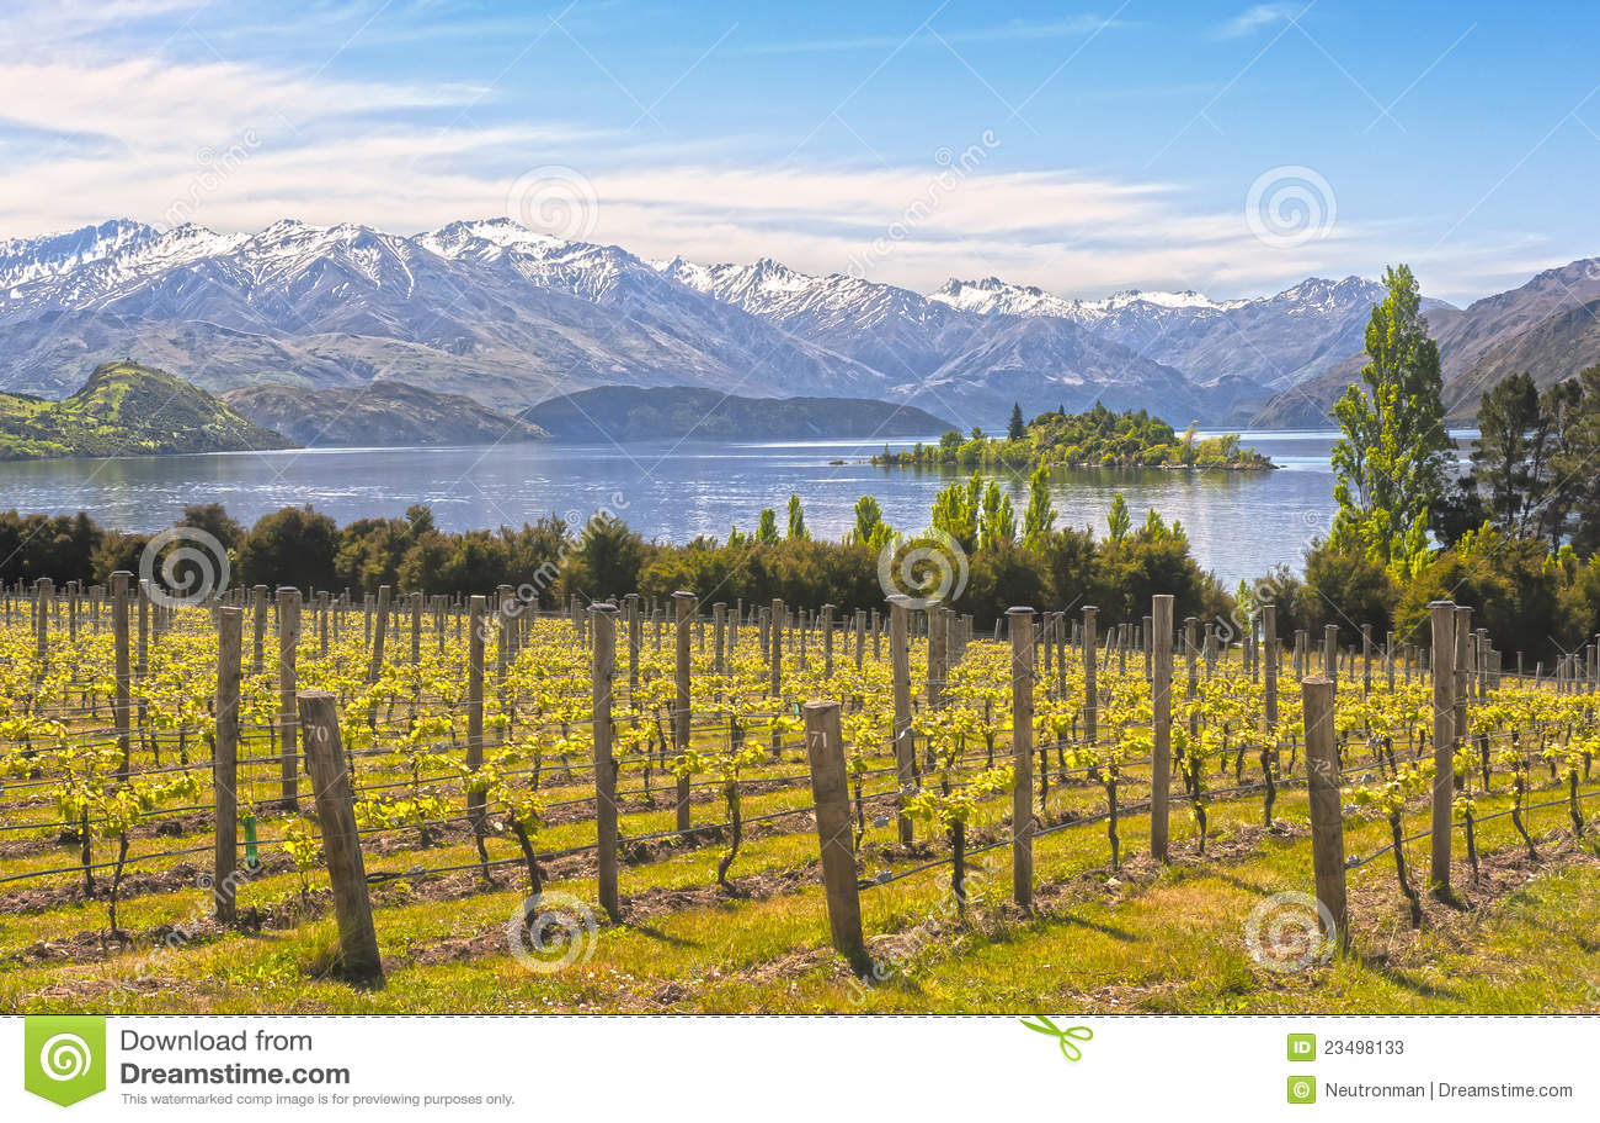 Vineyard on the lake - New Zealand